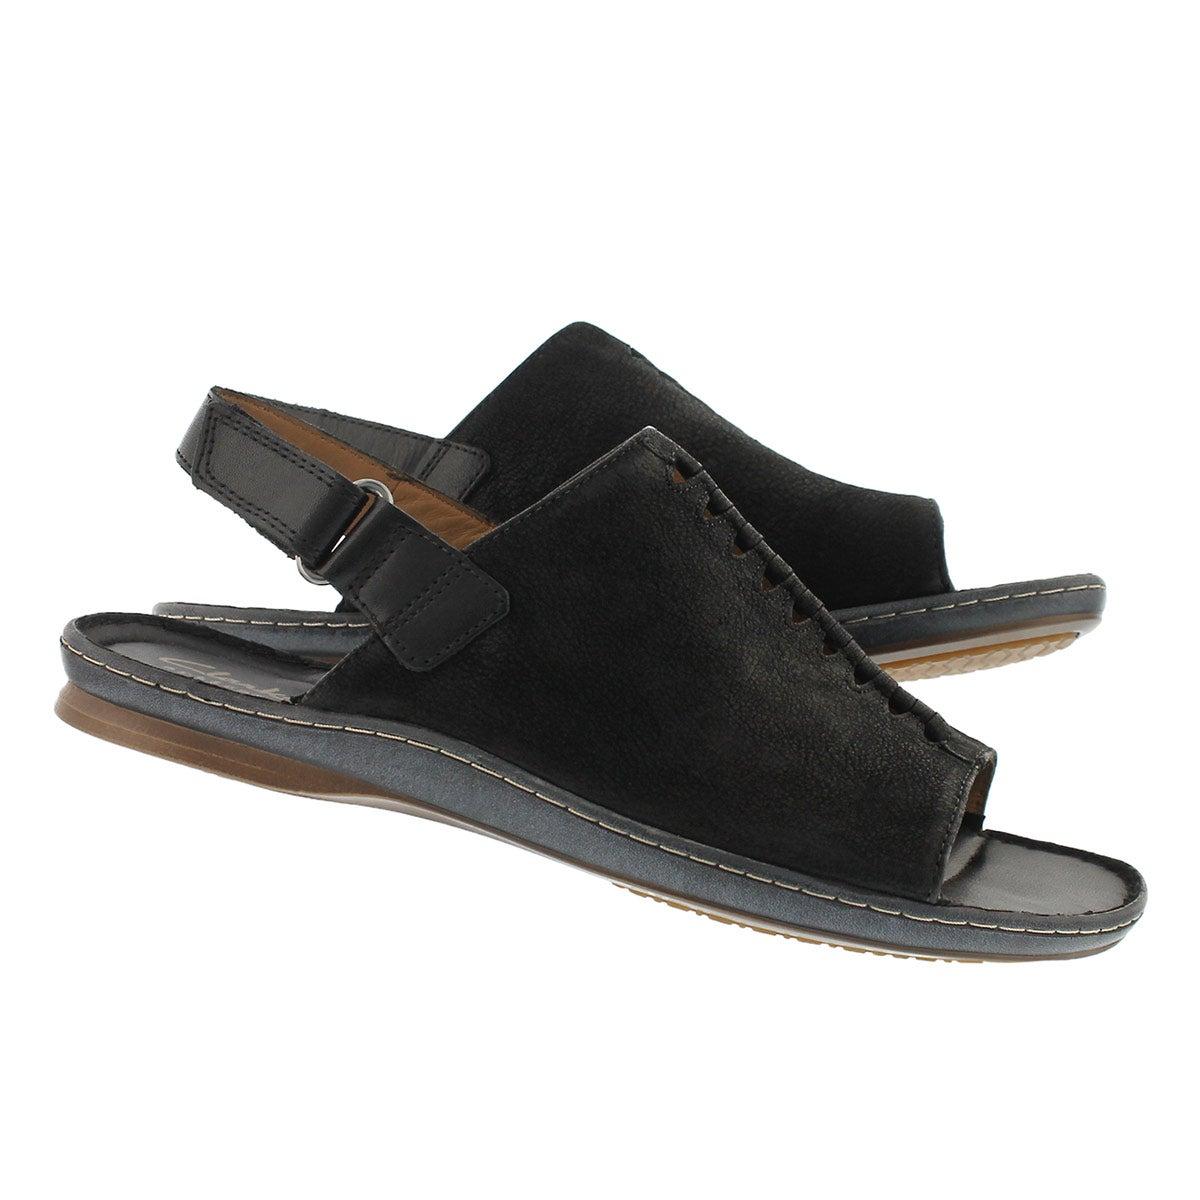 Lds Sarla Forte black casual sandal